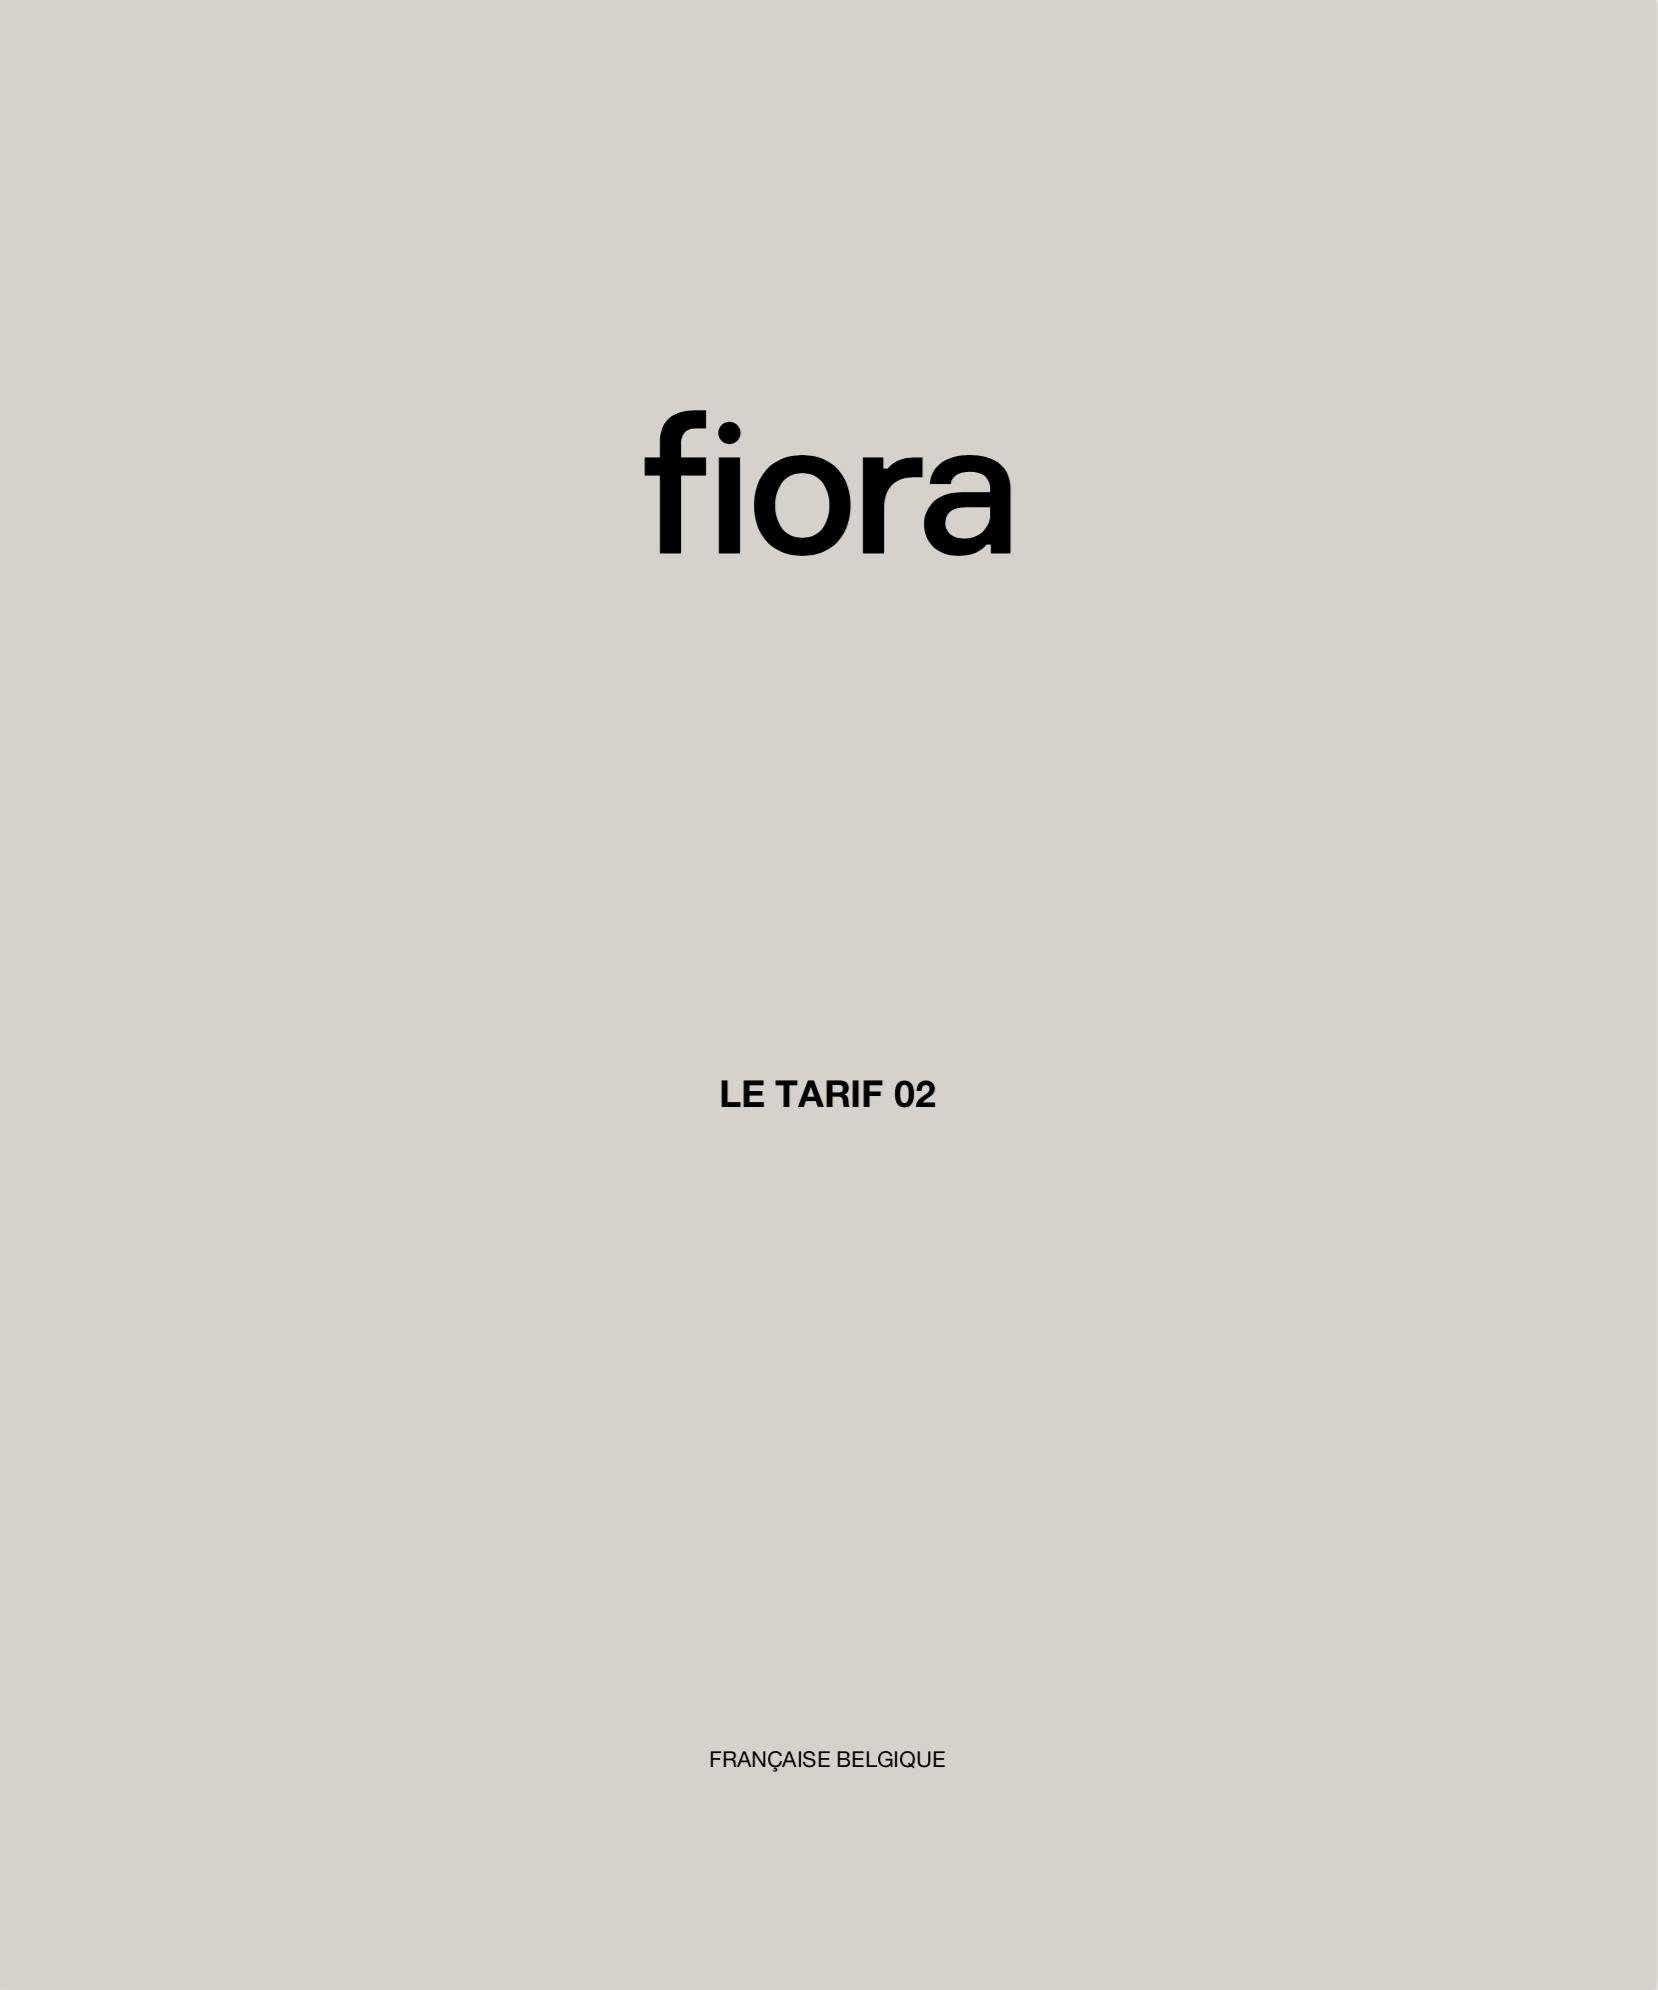 fiorafr2019